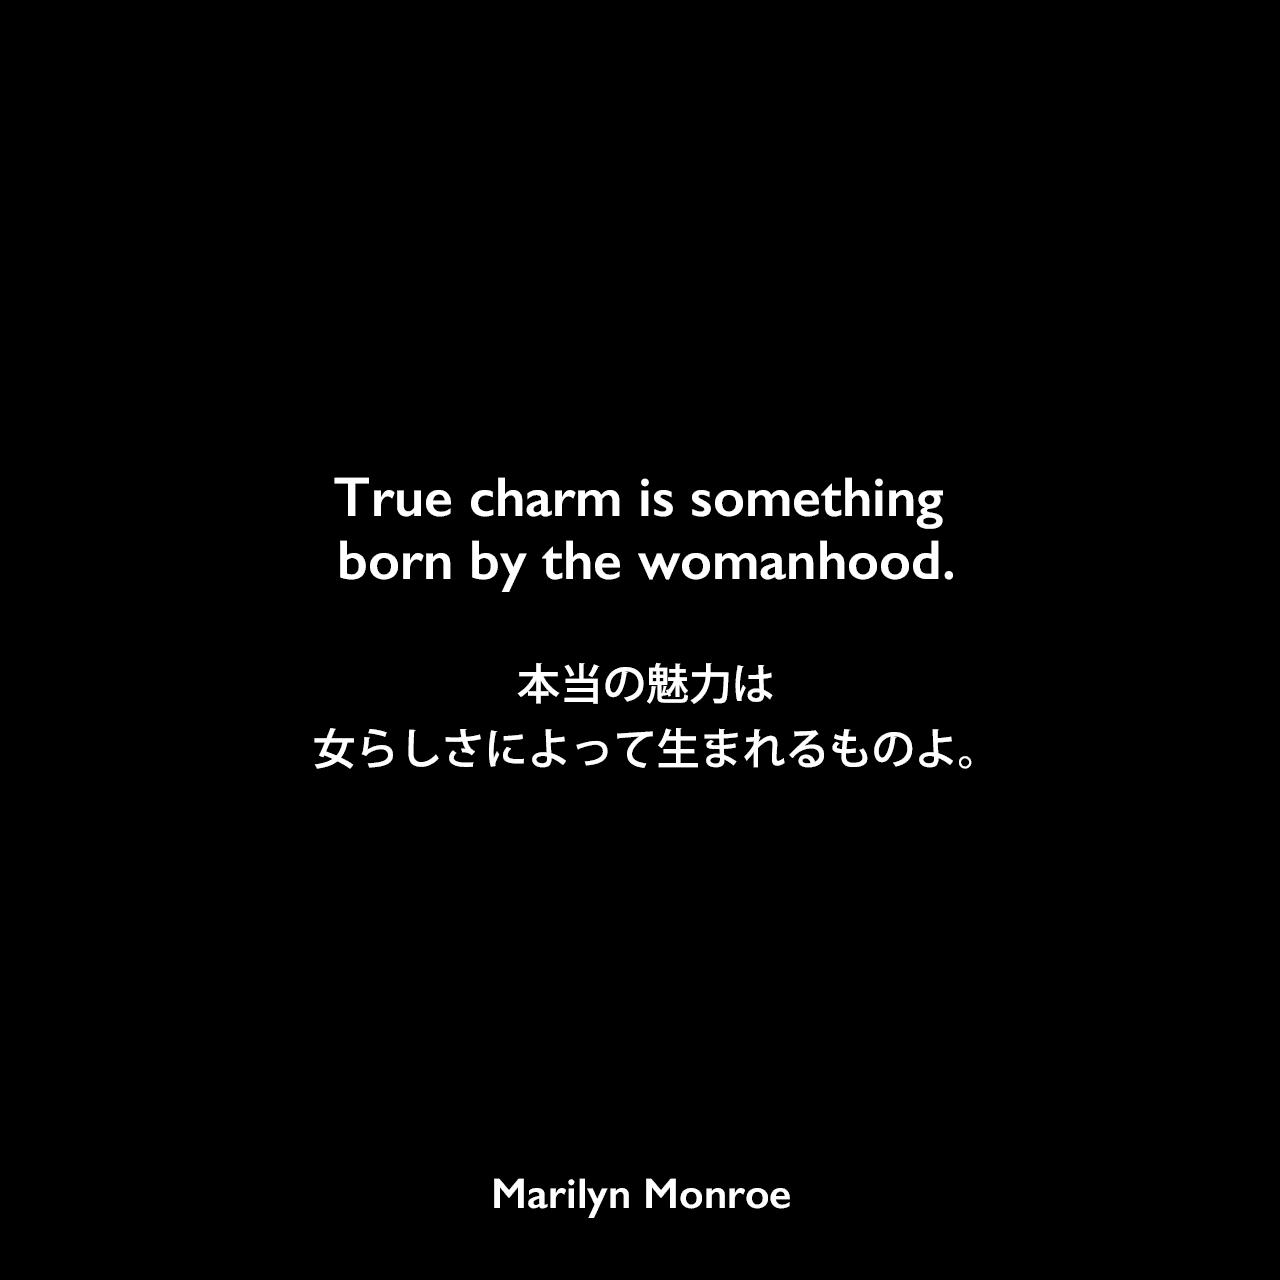 True charm is something born by the womanhood.本当の魅力は女らしさによって生まれるものよ。Marilyn Monroe